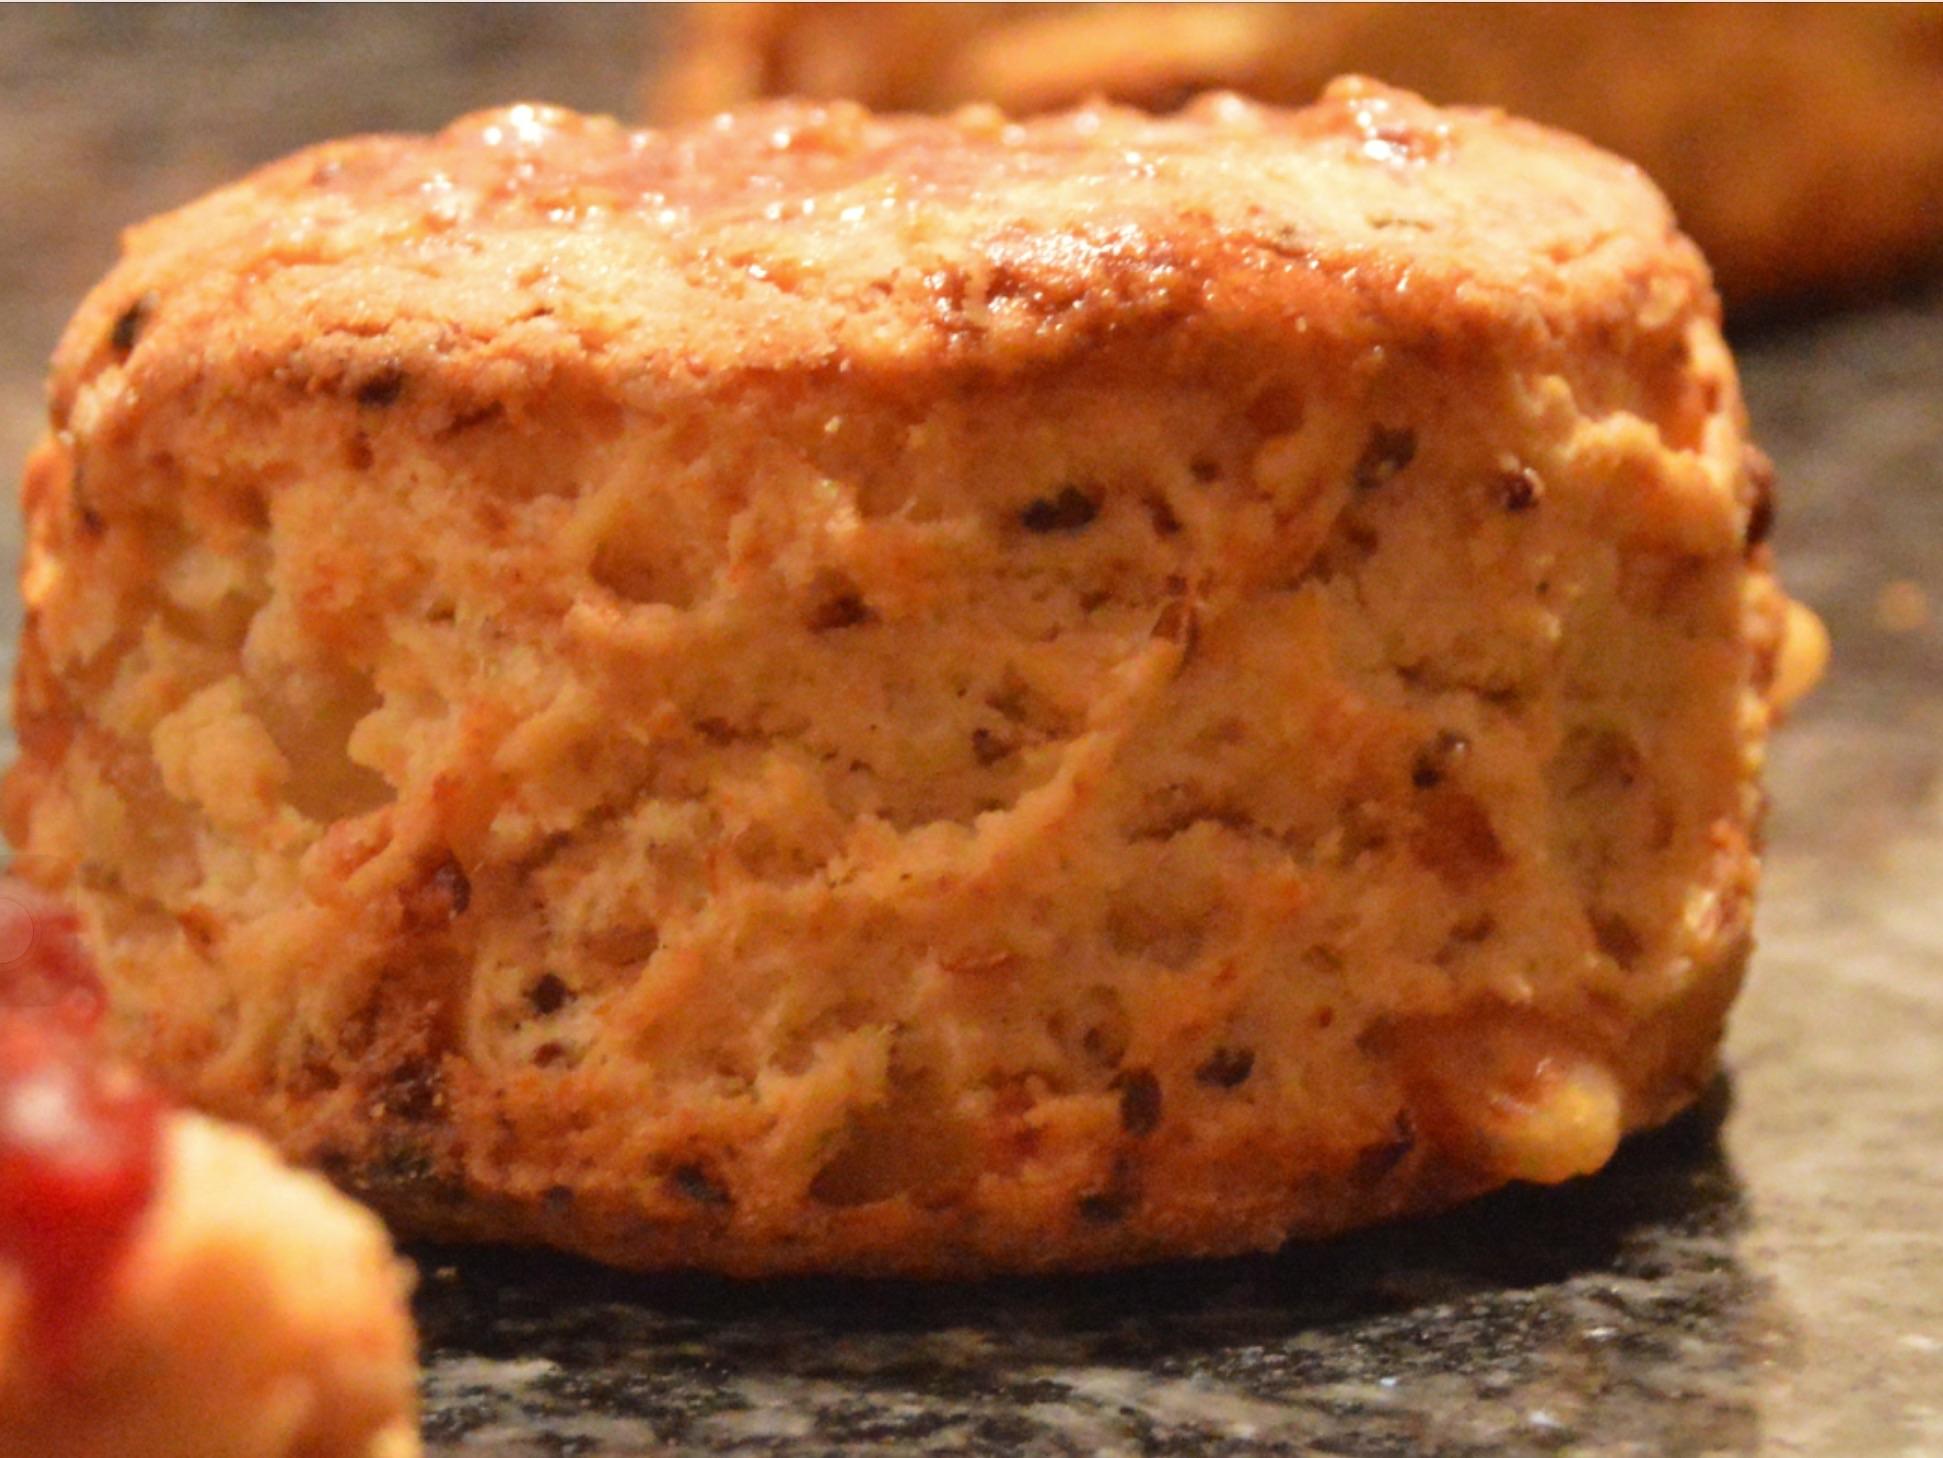 Roasted onion & smoked cheese scones | bakingfanatic